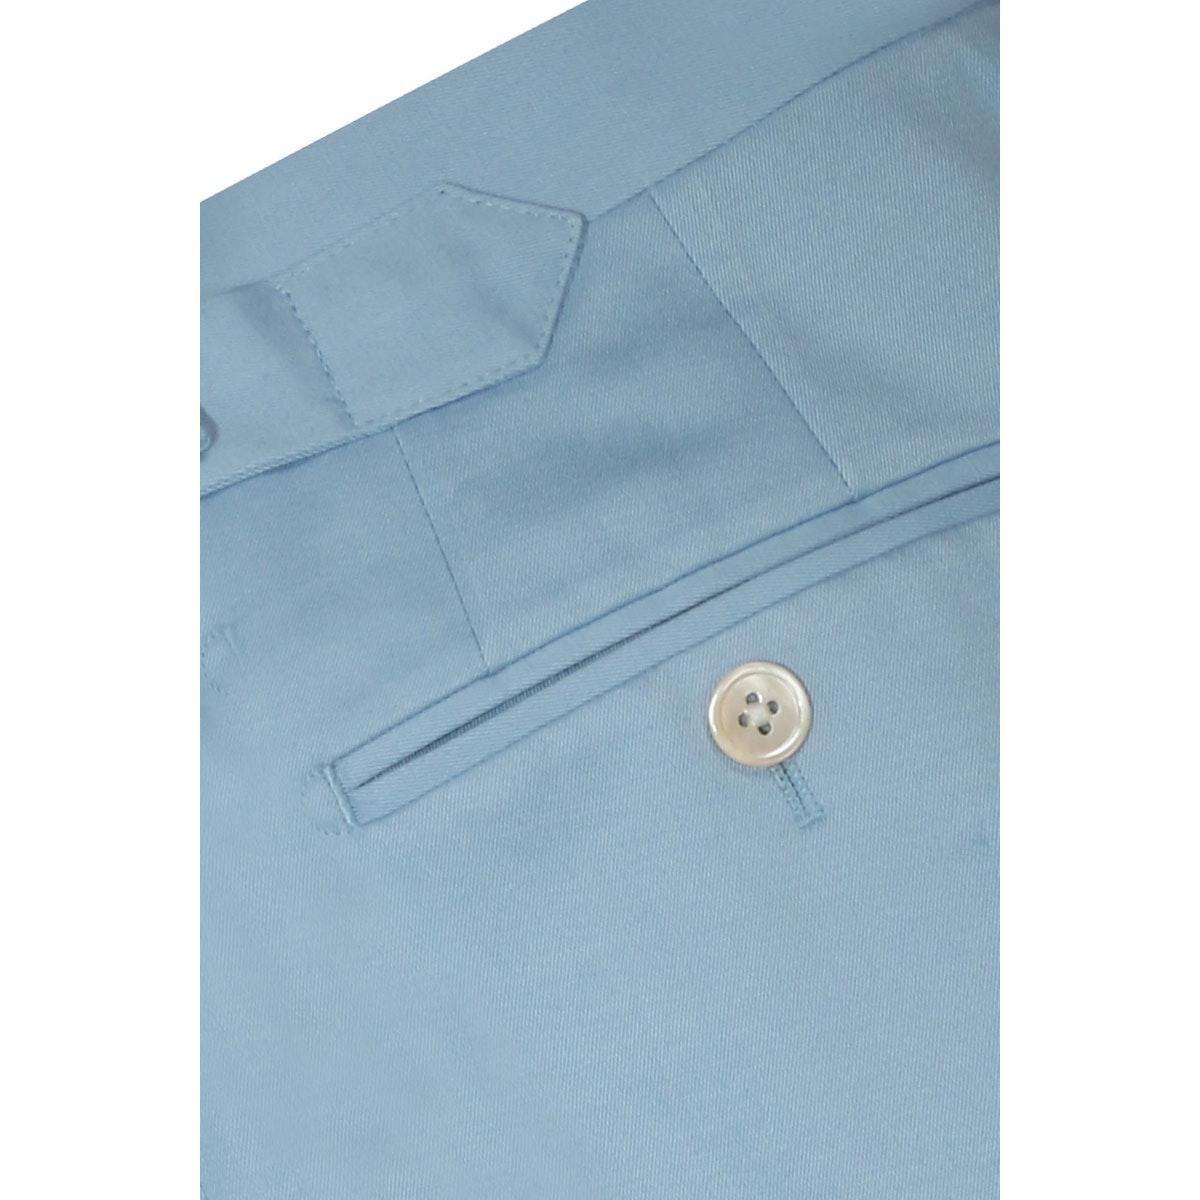 InStitchu Collection The Sinatra Light Blue Cotton Pants